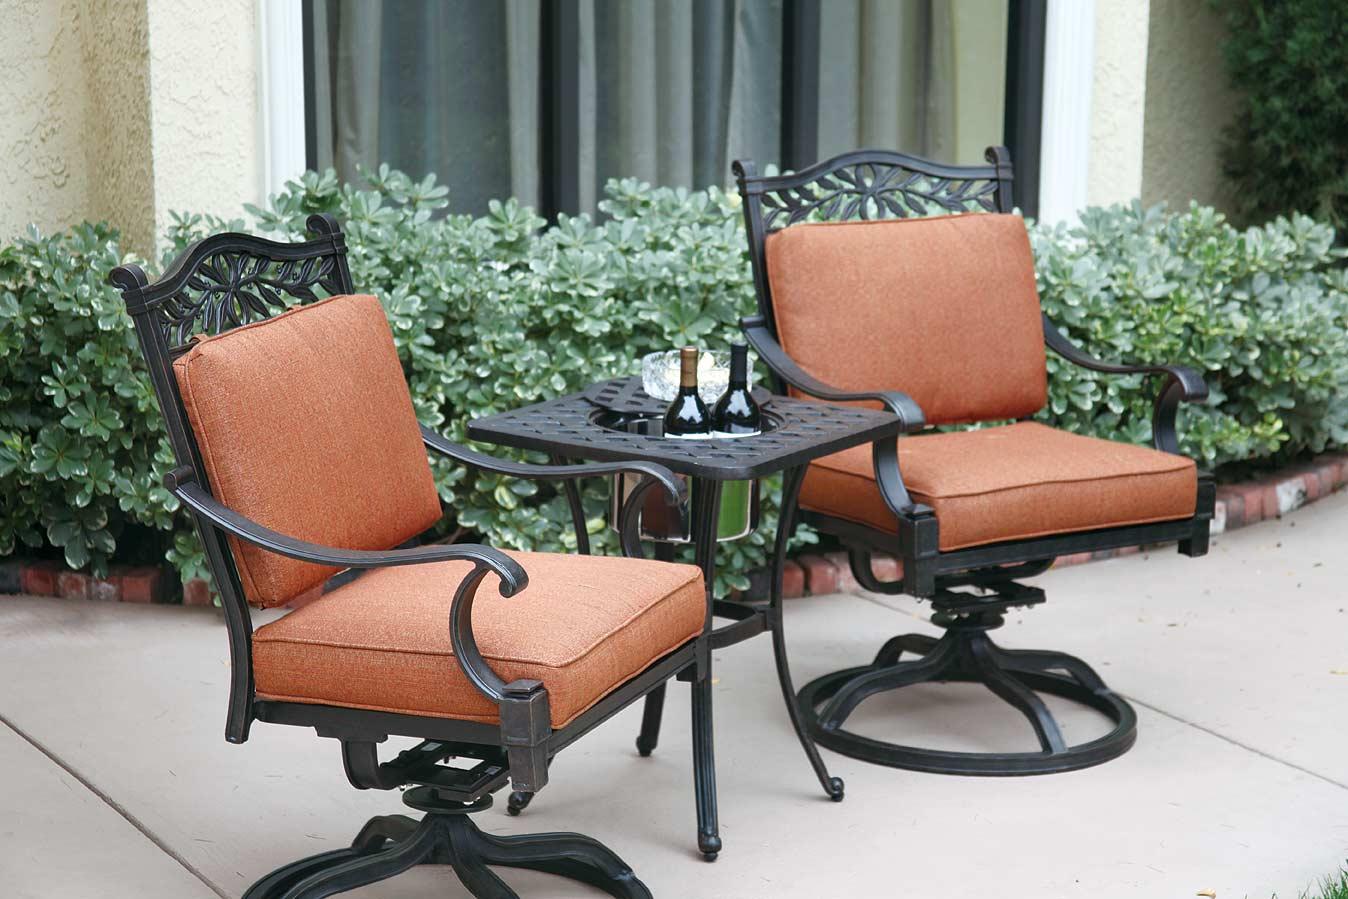 bistro set with swivel chairs best baby rocking chair glider patio furniture cast aluminum rocker 3pc